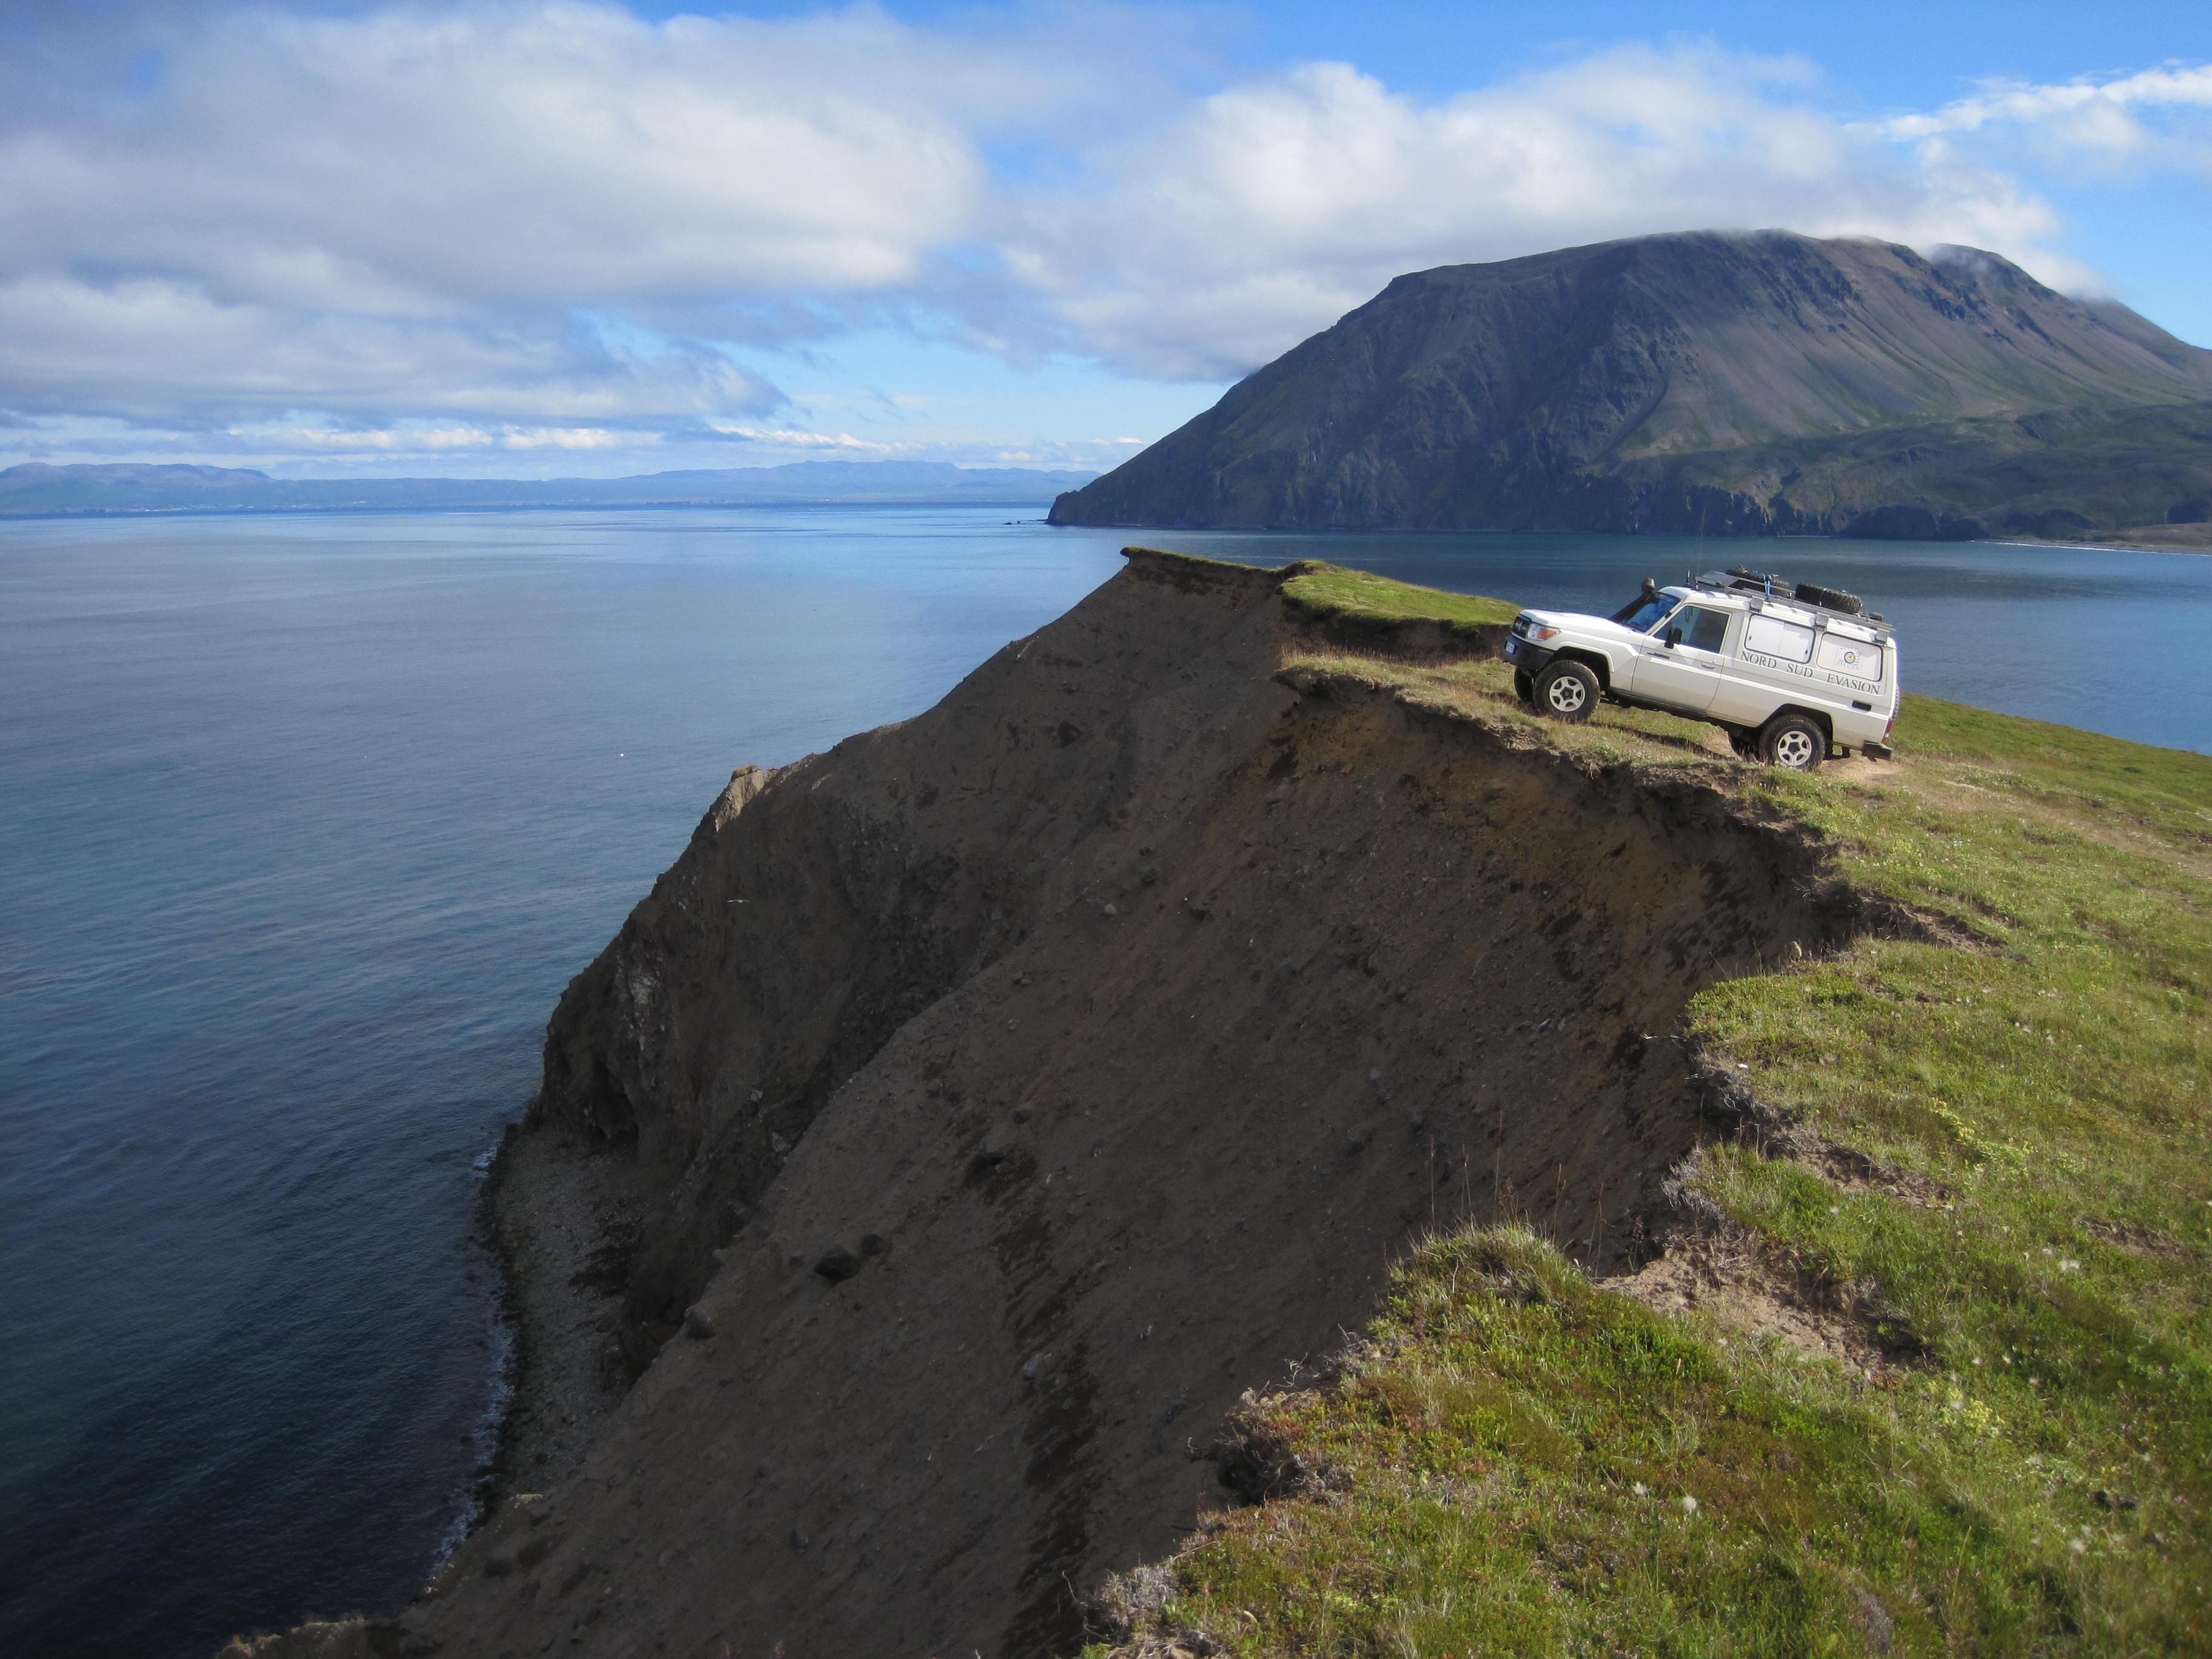 4x4 au sommet d'une falaise au bord de la mer en Islande raid 4x4 askja islande, août 2019